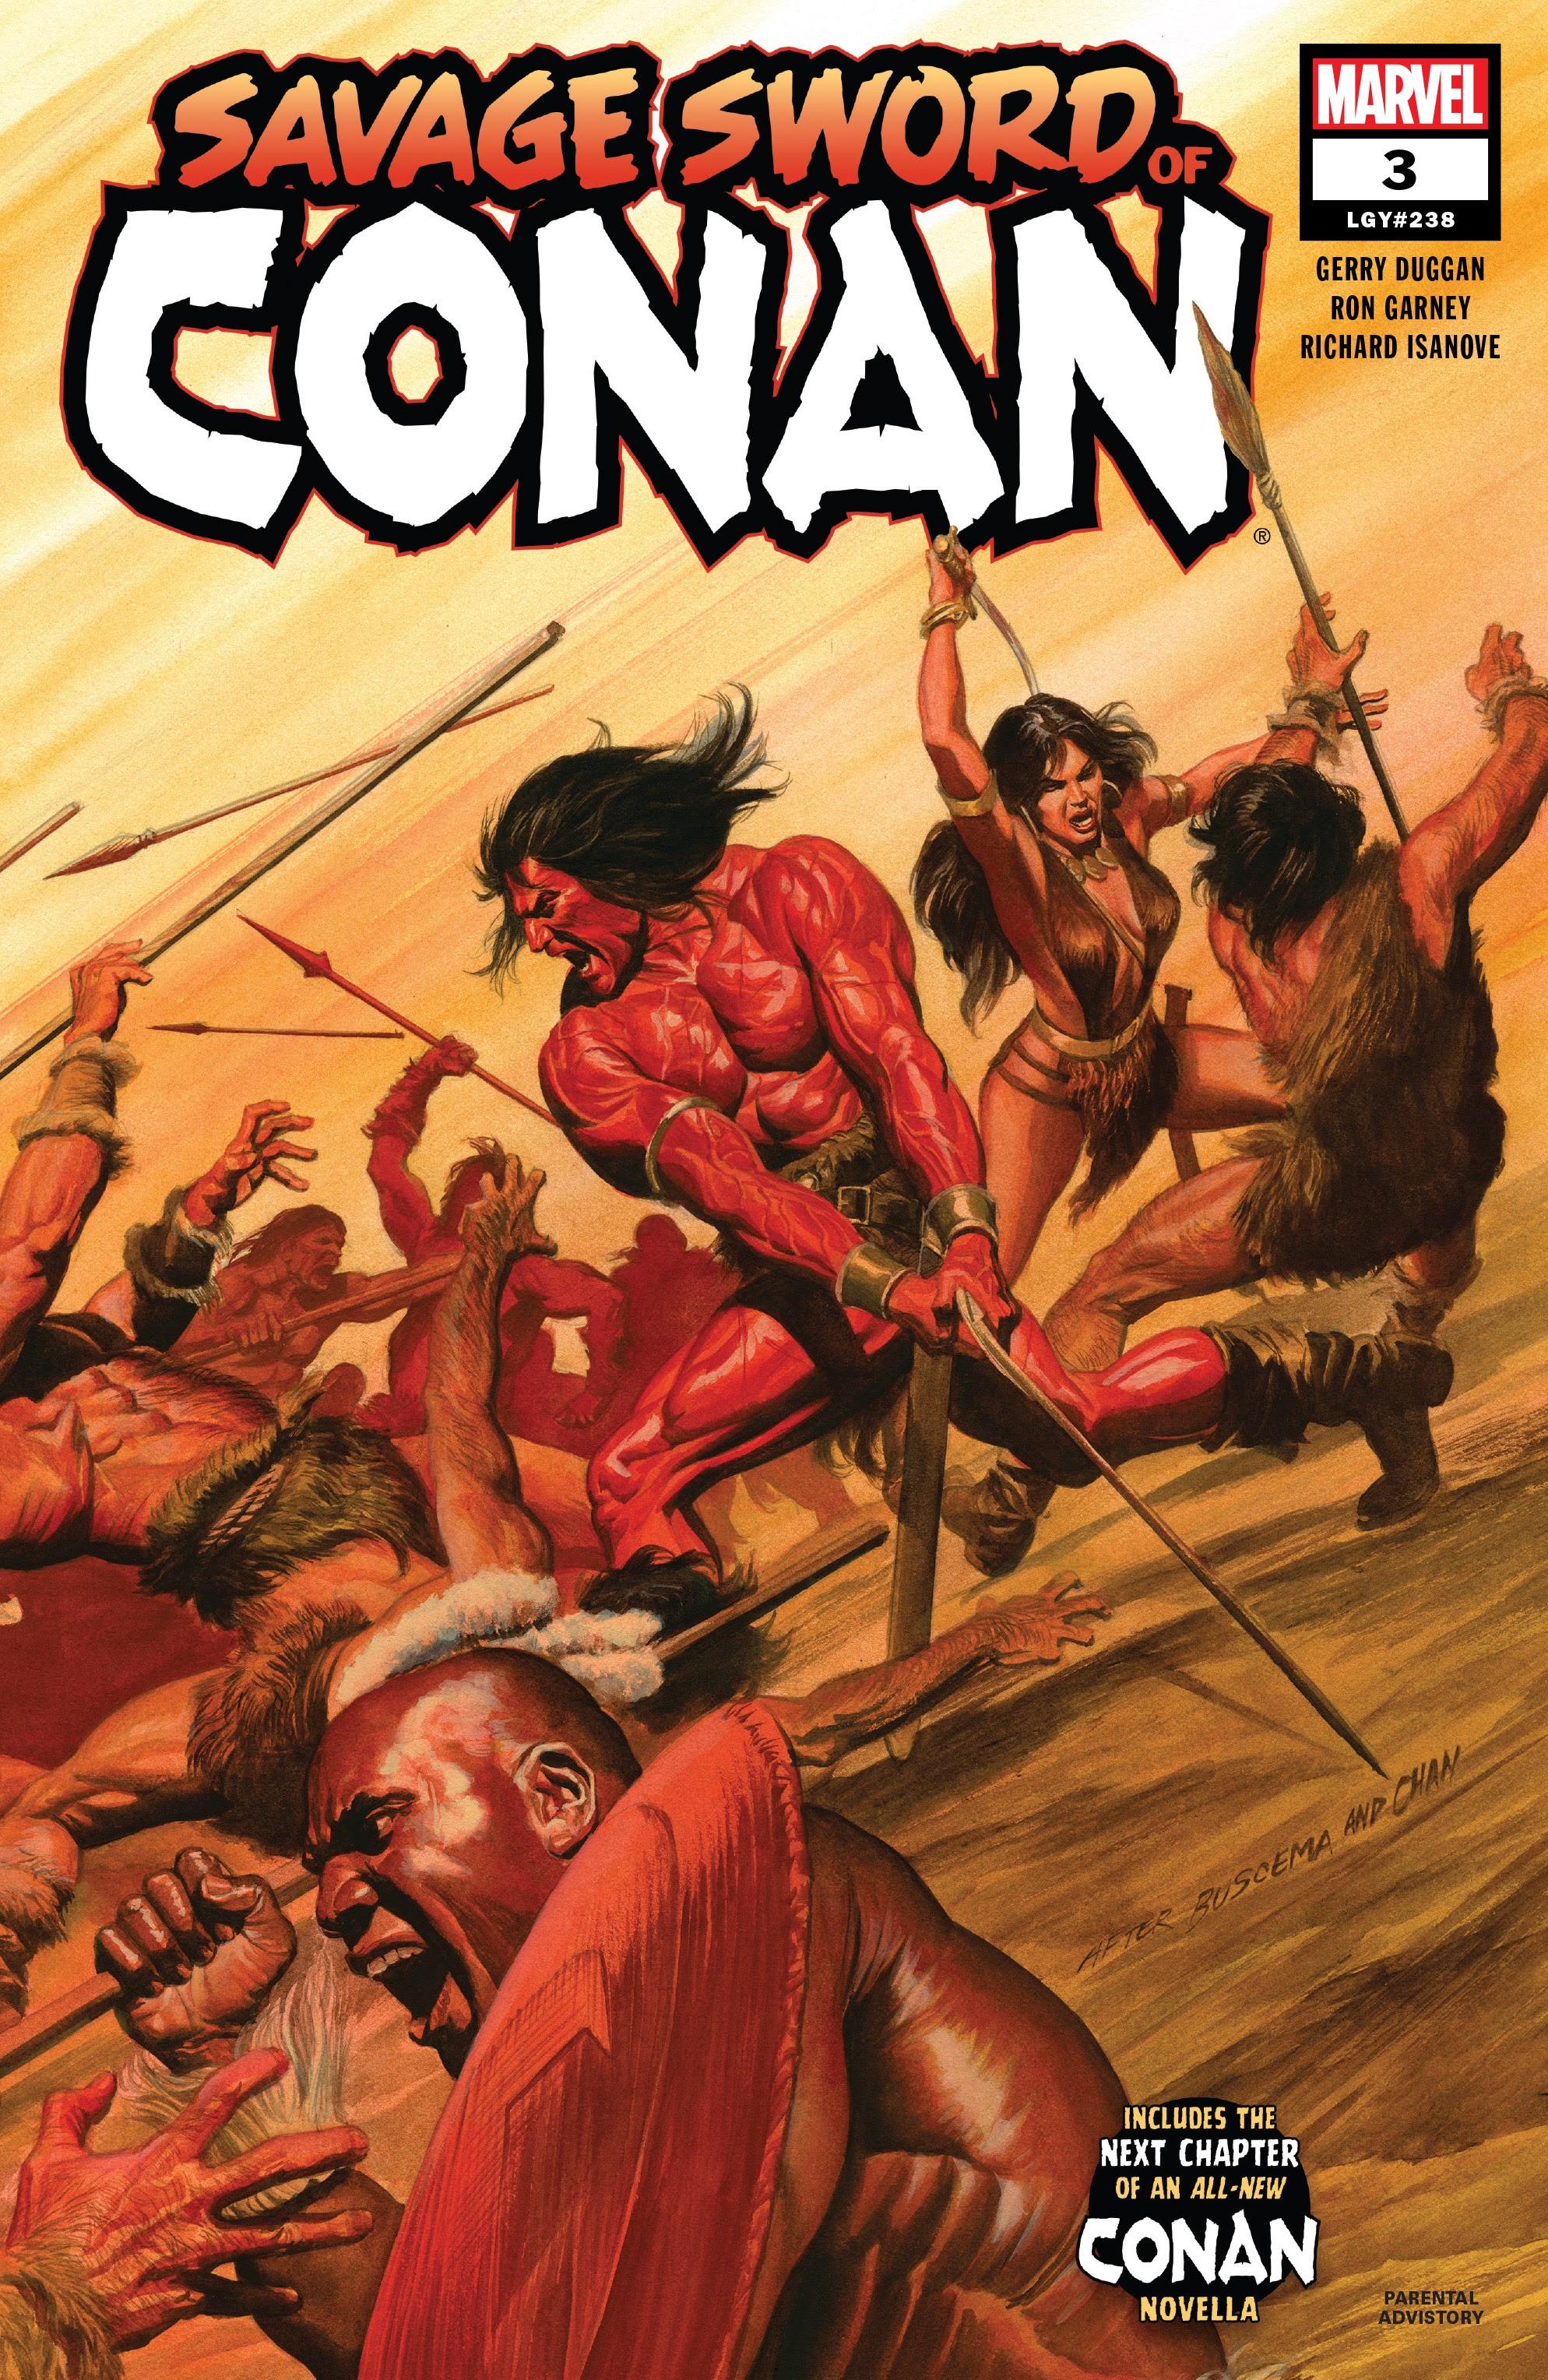 Read online Savage Sword of Conan comic -  Issue #3 - 1